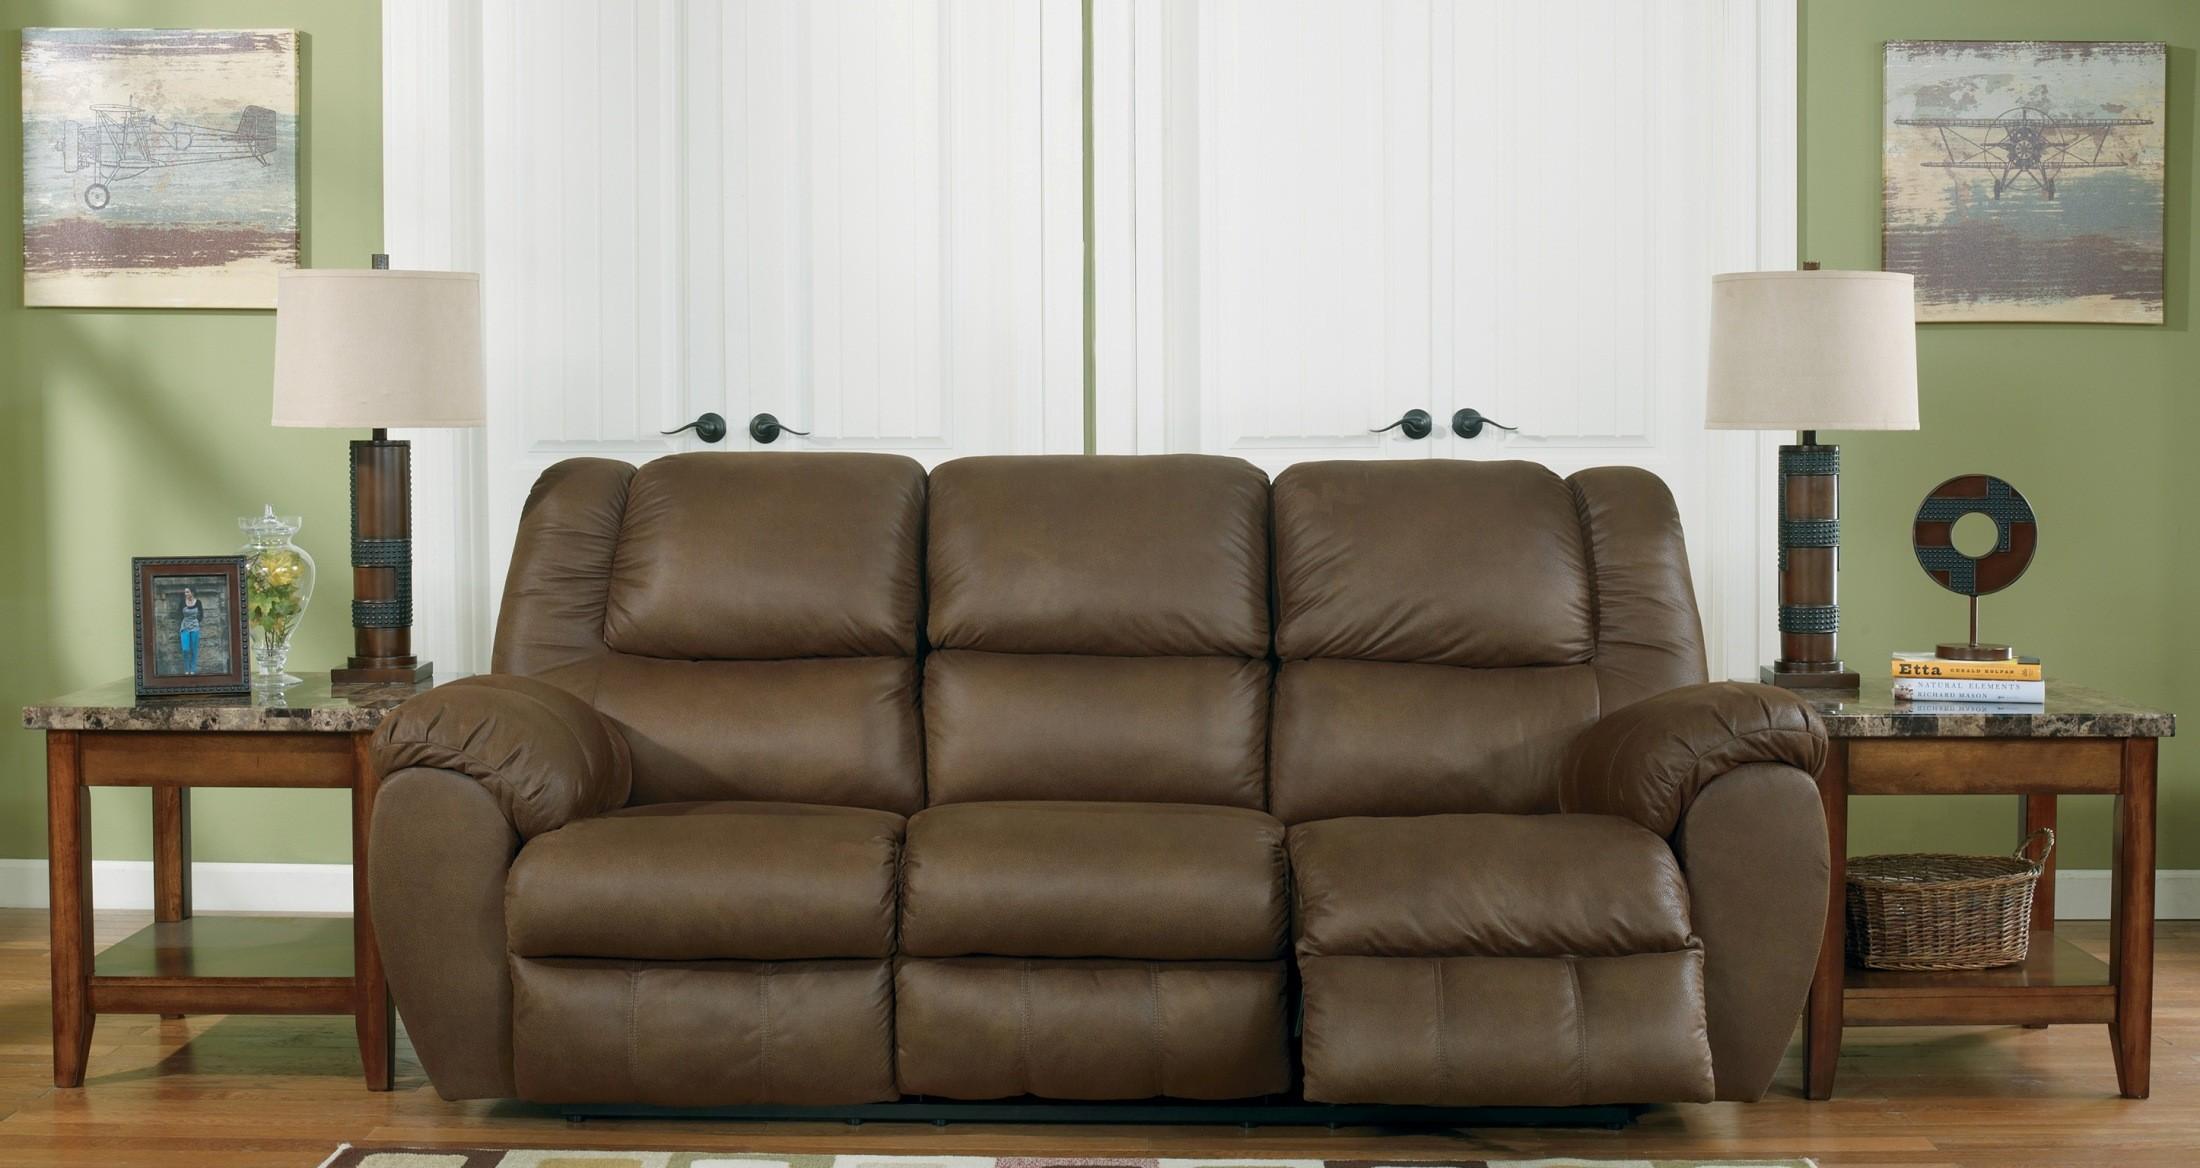 Quarterback Canyon Reclining Sofa From Ashley 3270188 Coleman Furniture